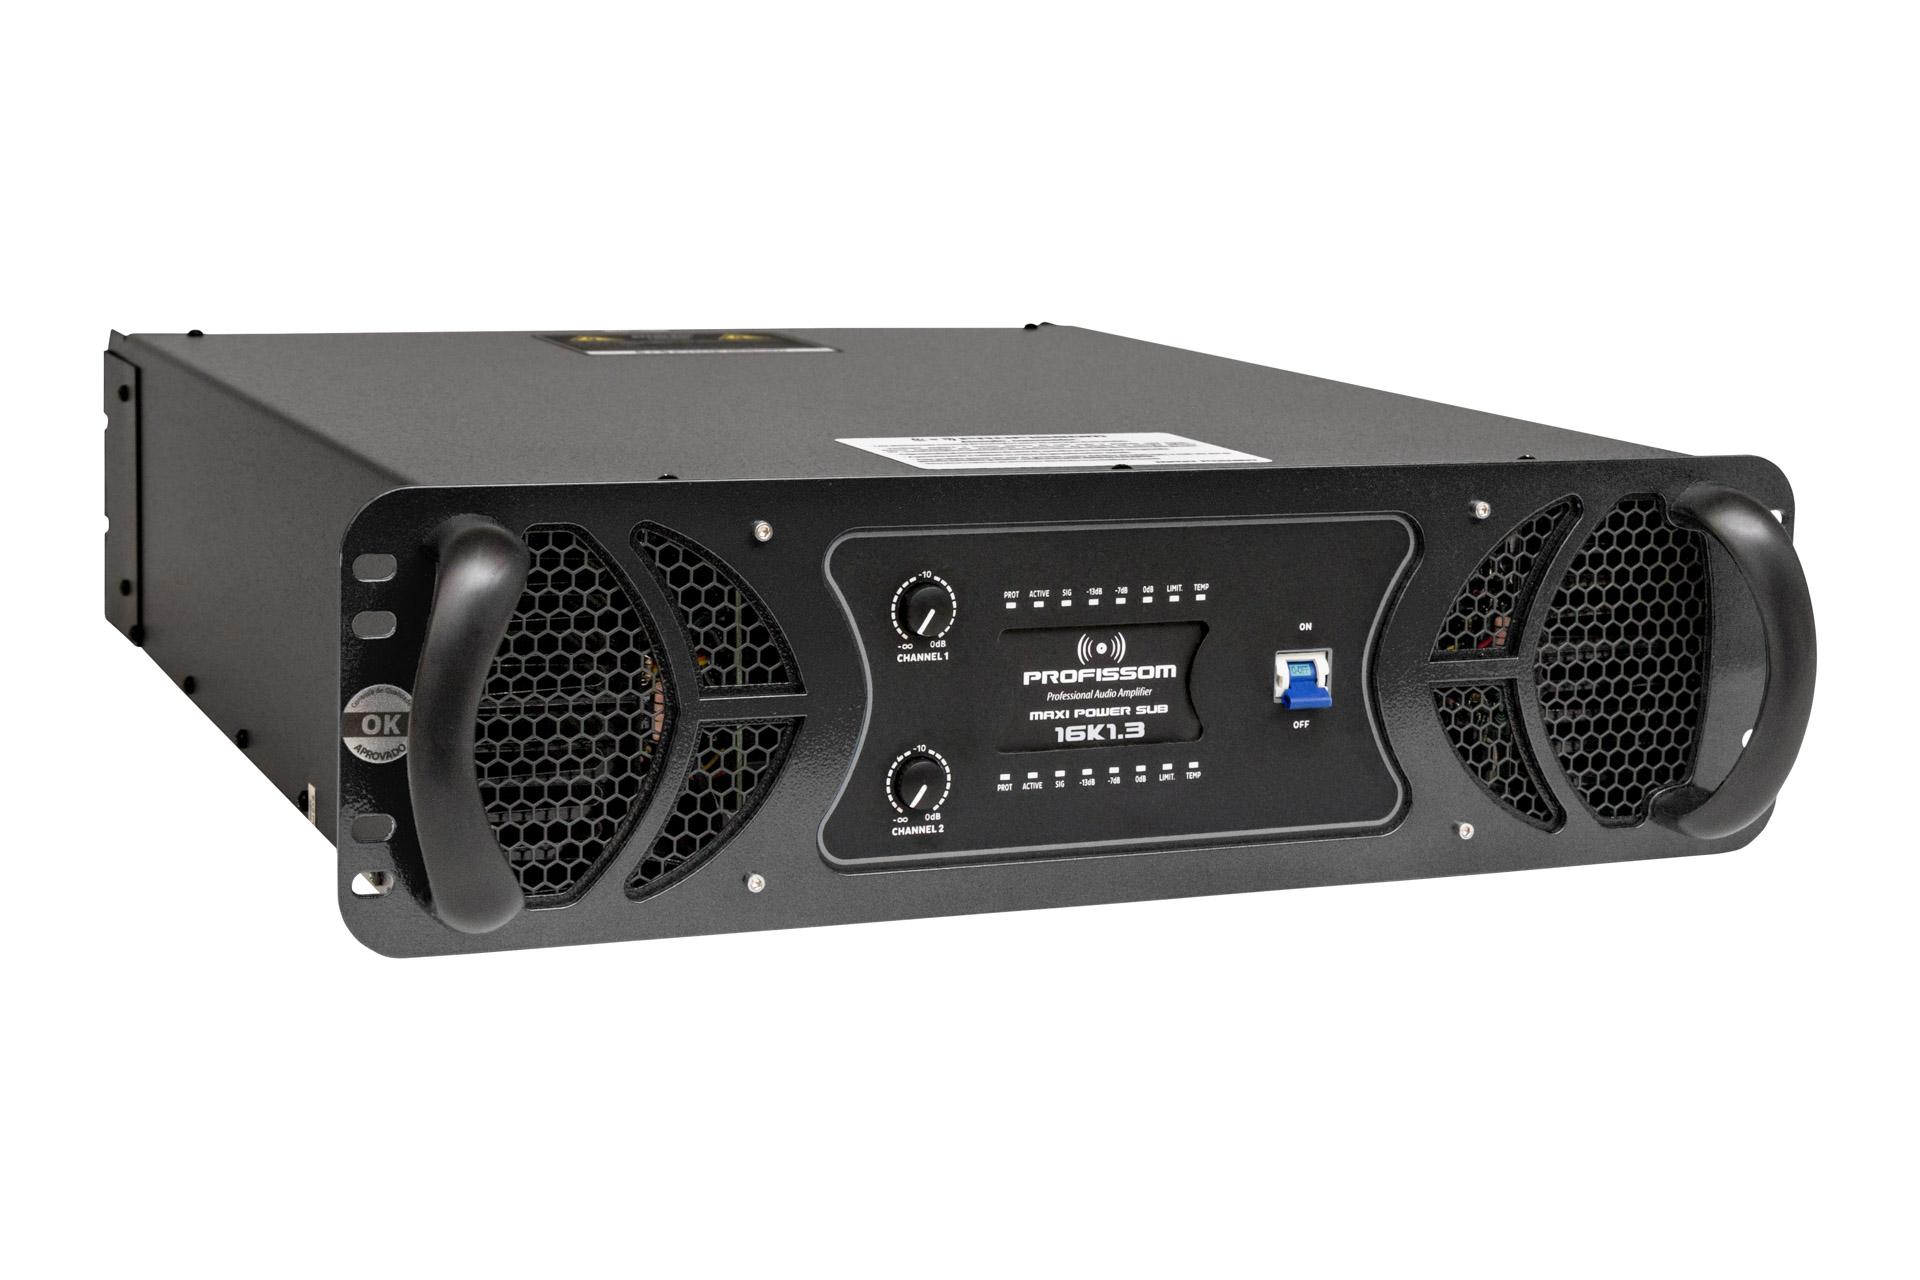 Amplificador Profissom Maxi Power Sub 16K1.3